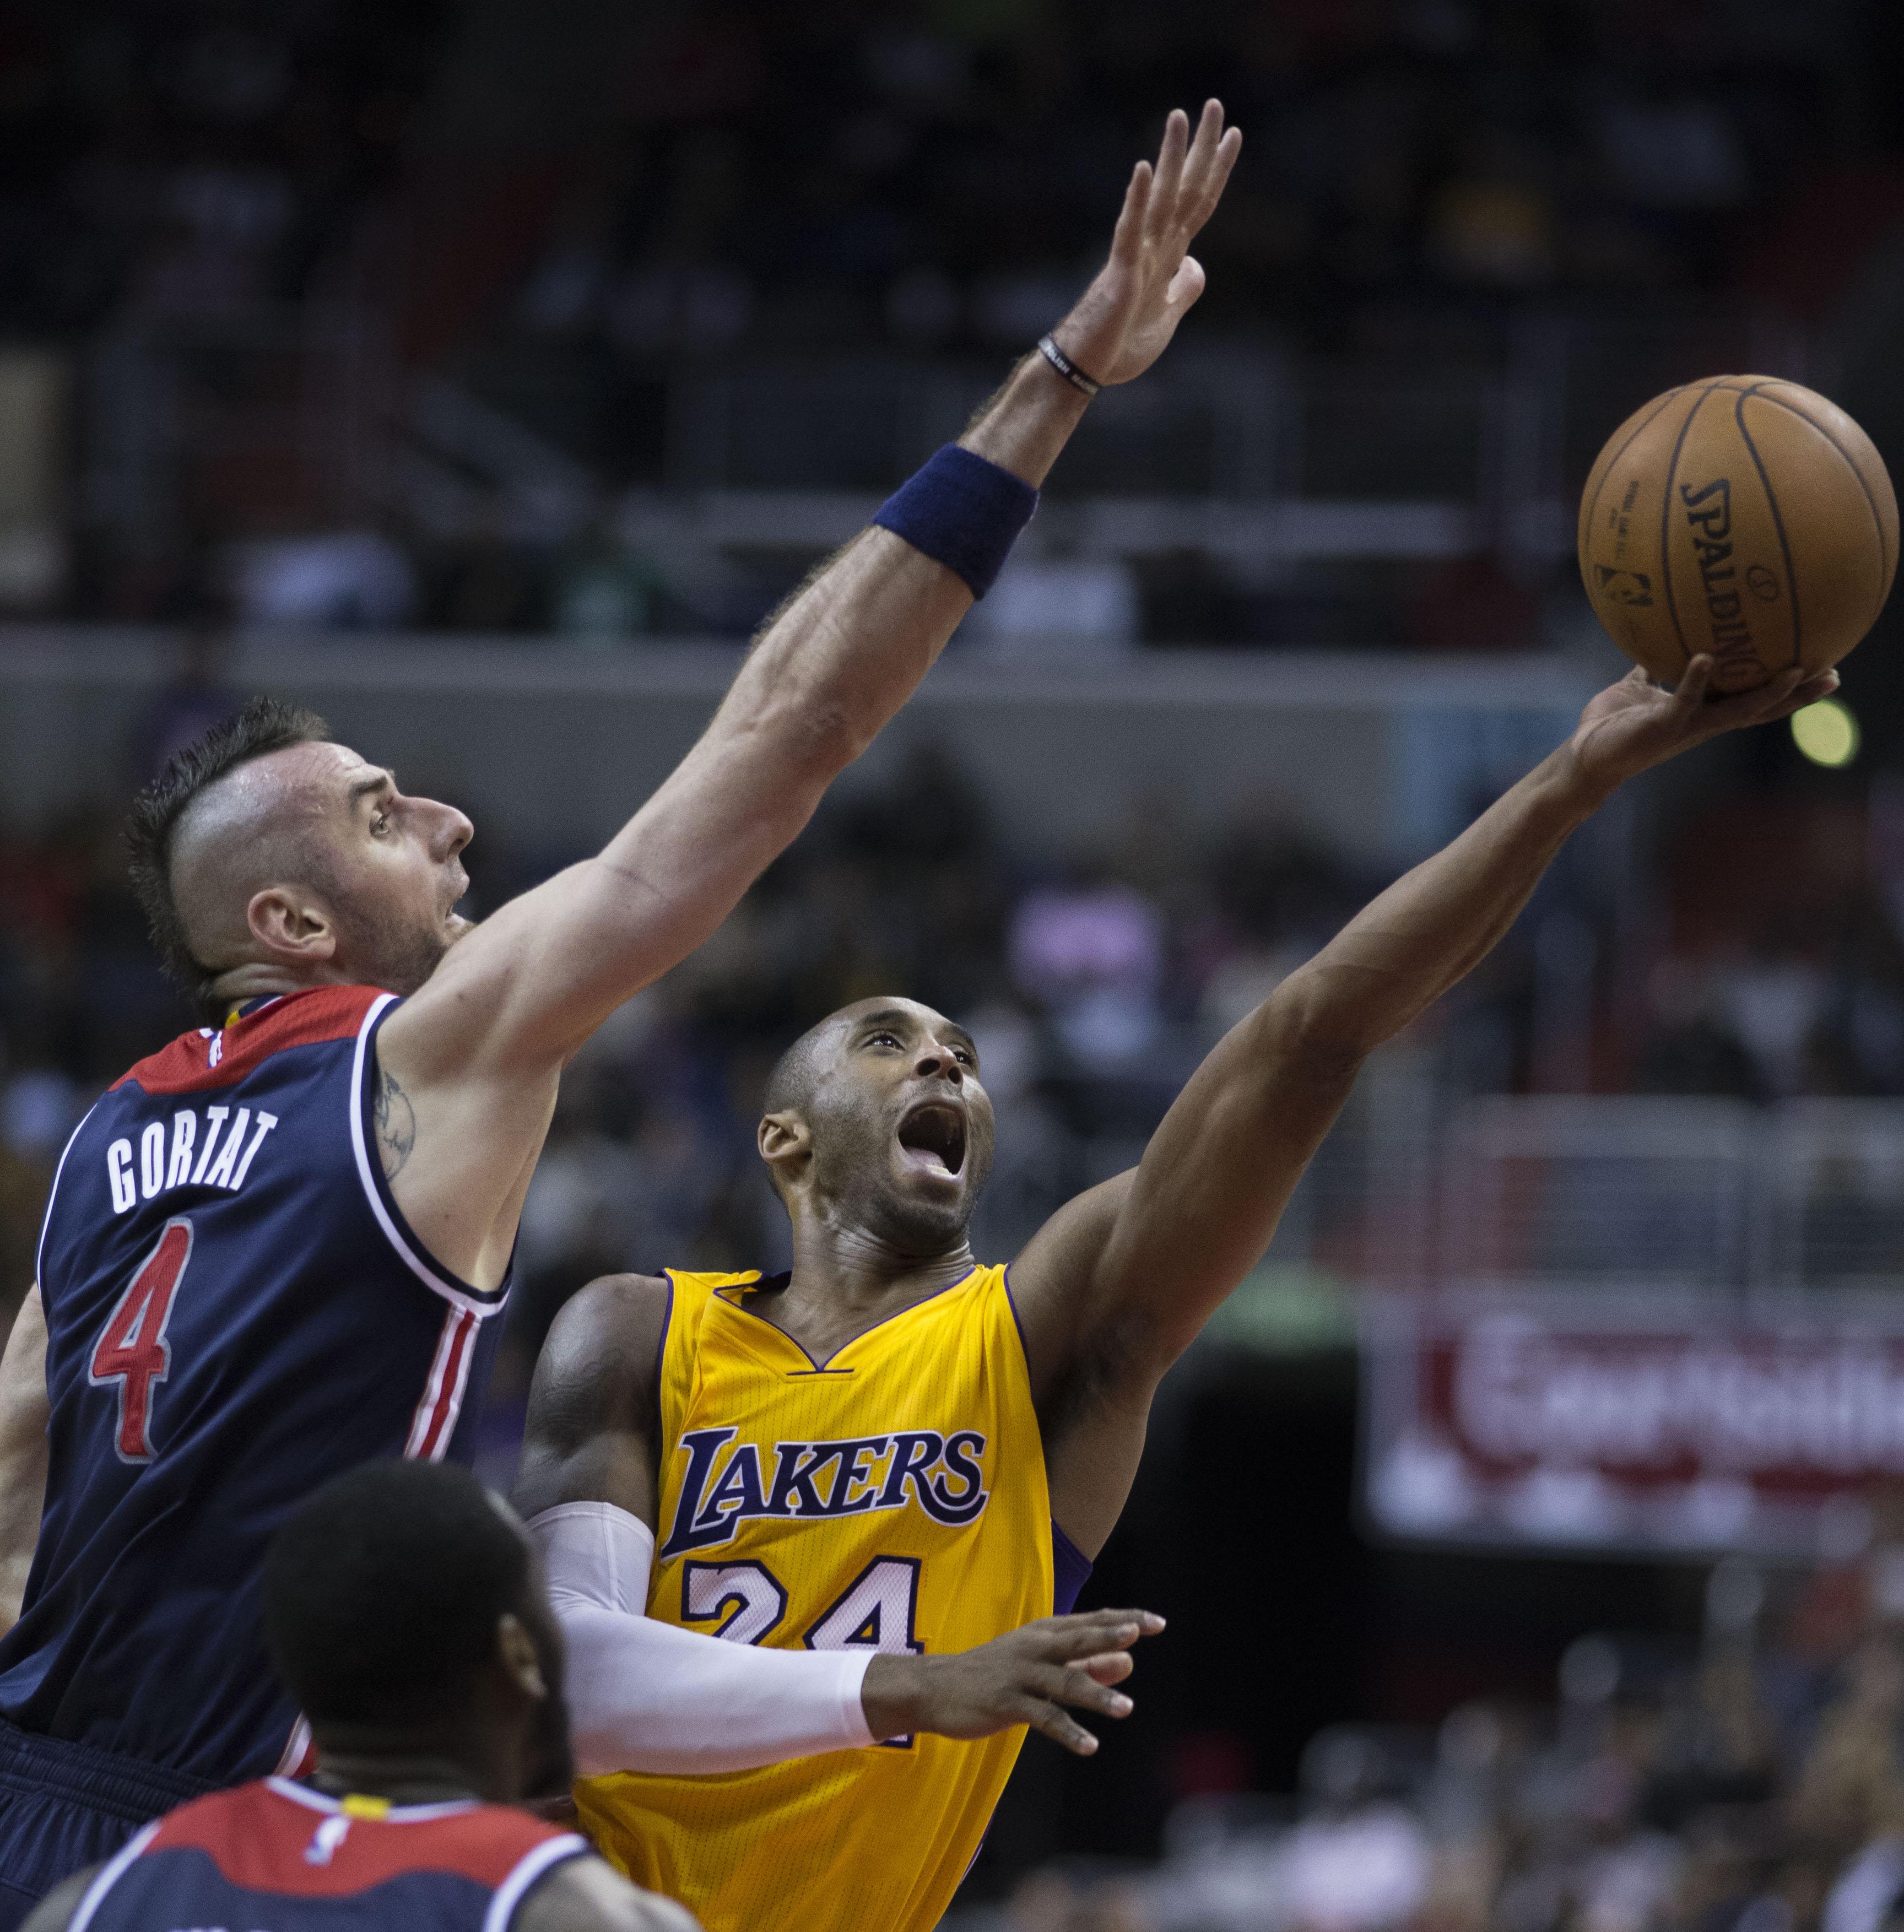 best Kobe Bryant achievements, Kobe Bryant death, basketball player, basketball